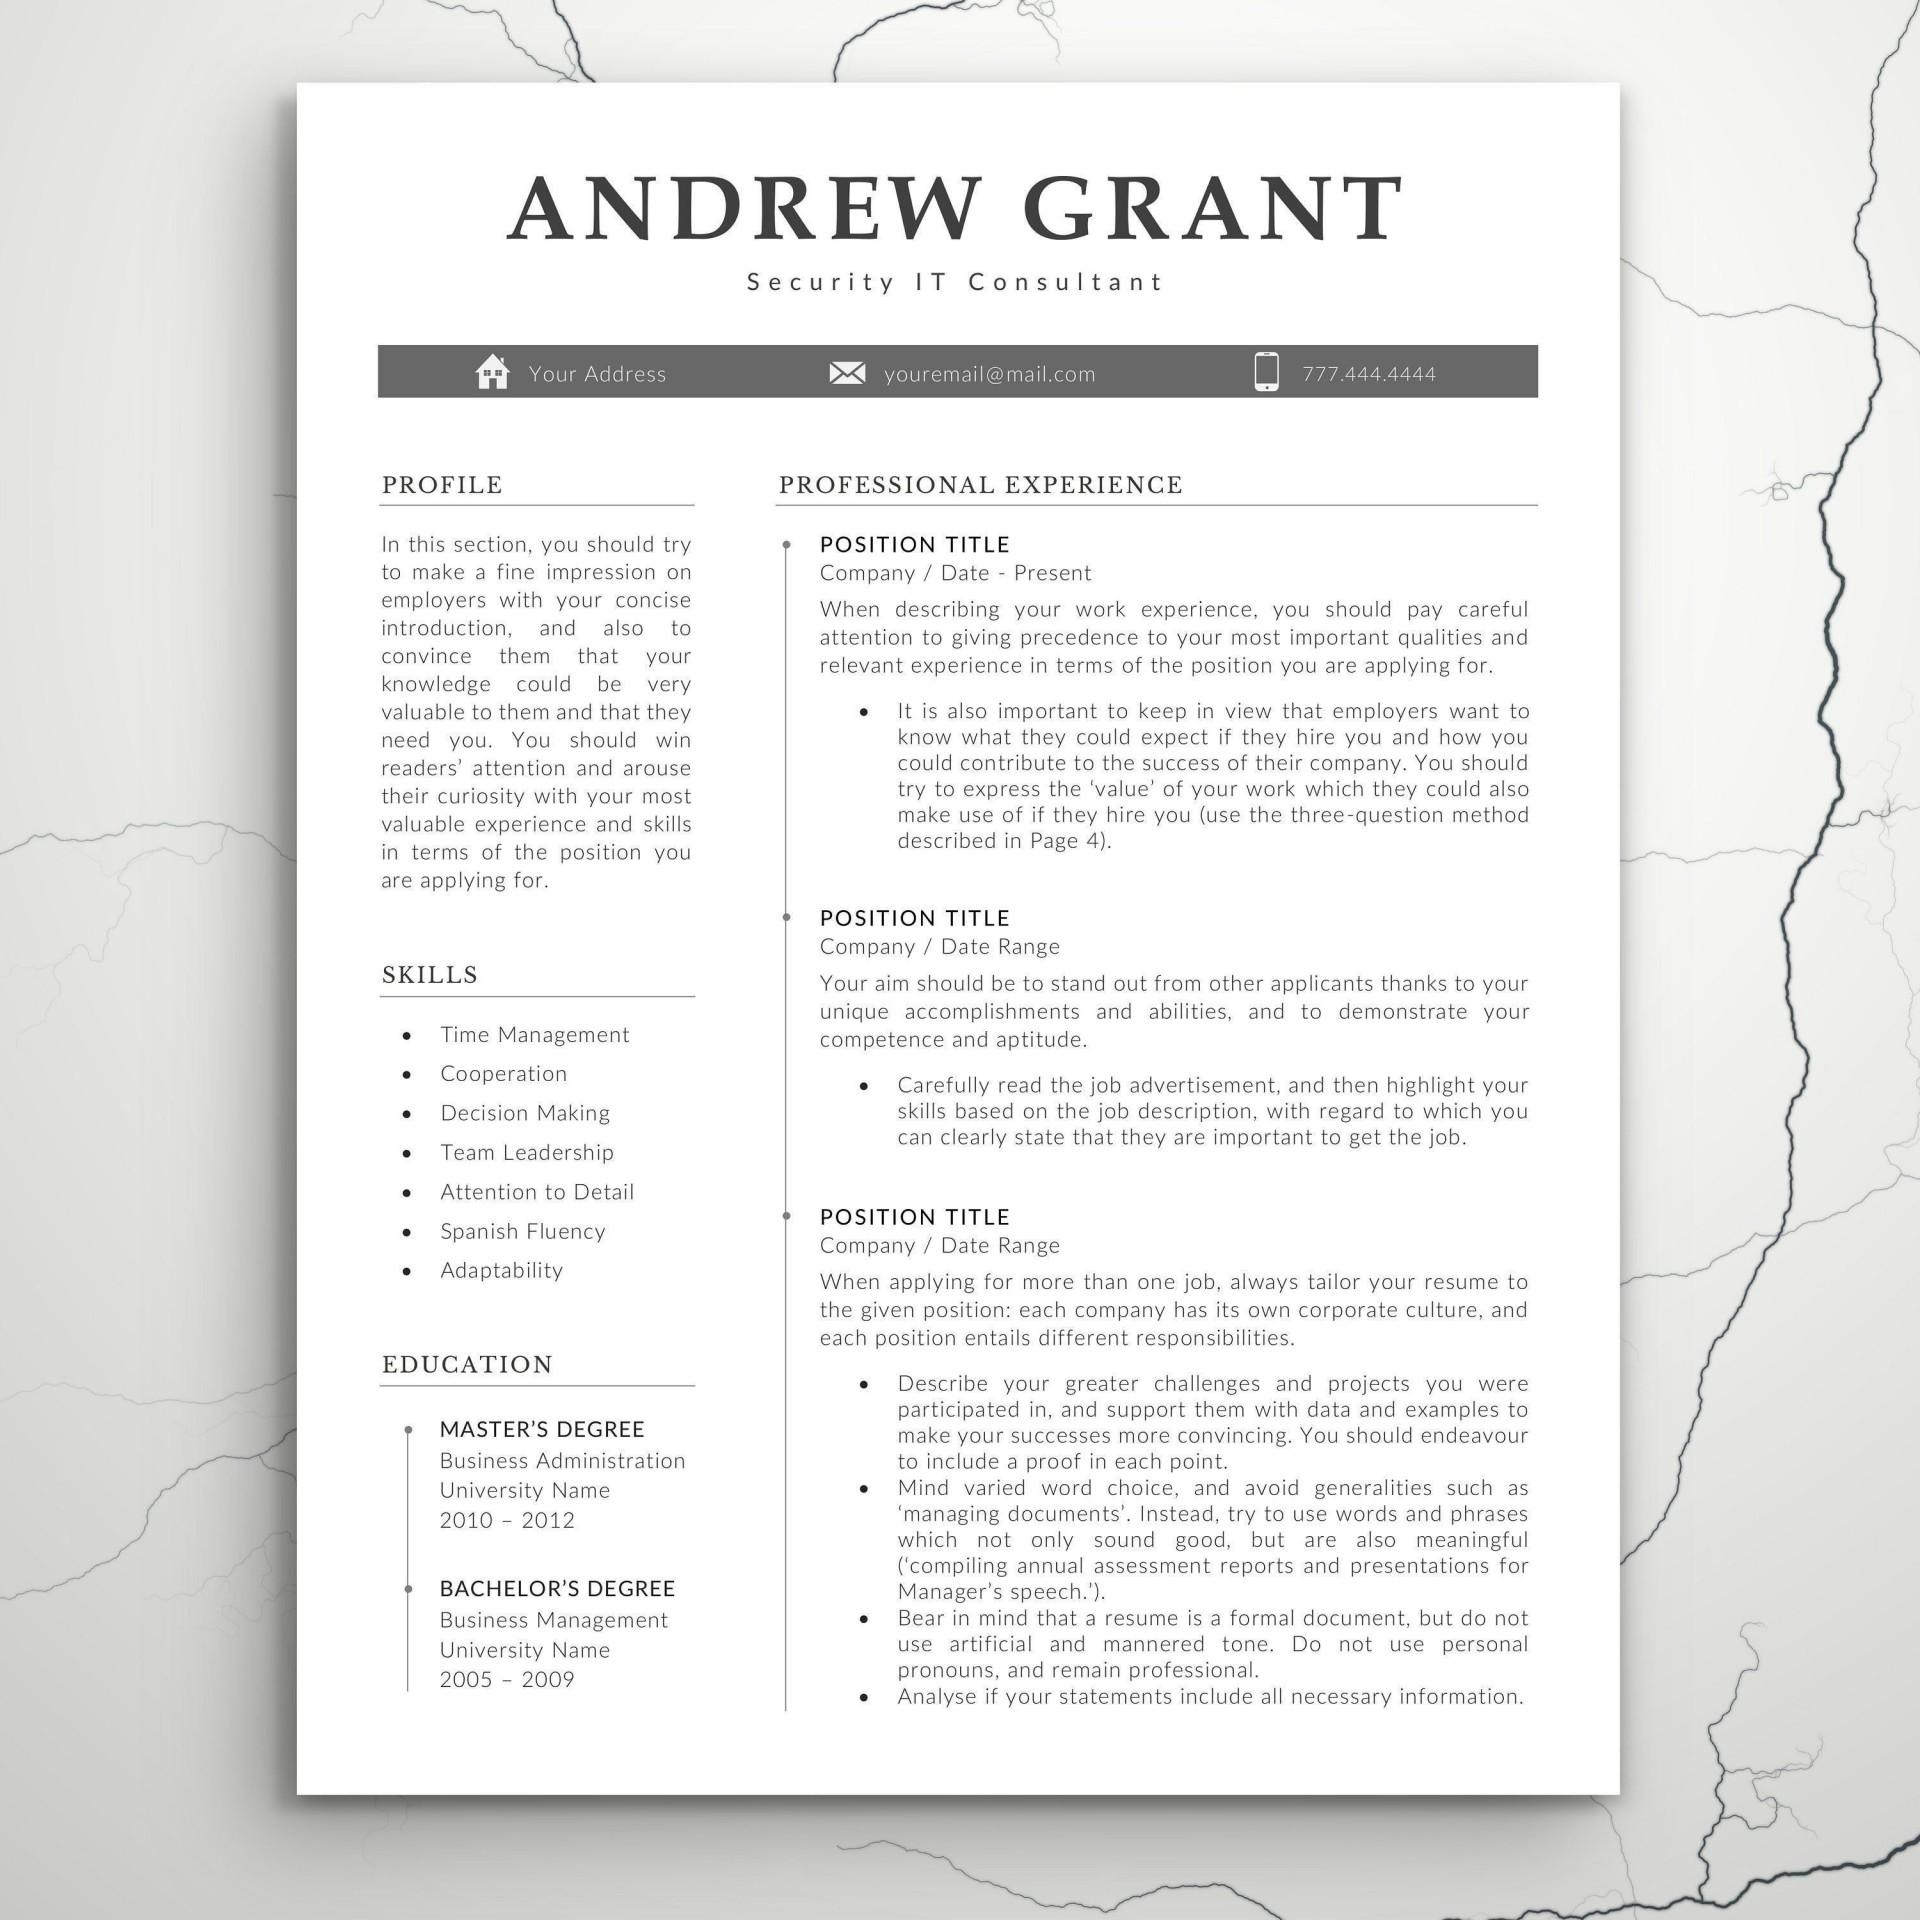 007 Excellent Teacher Resume Template Microsoft Word 2007 High Resolution 1920